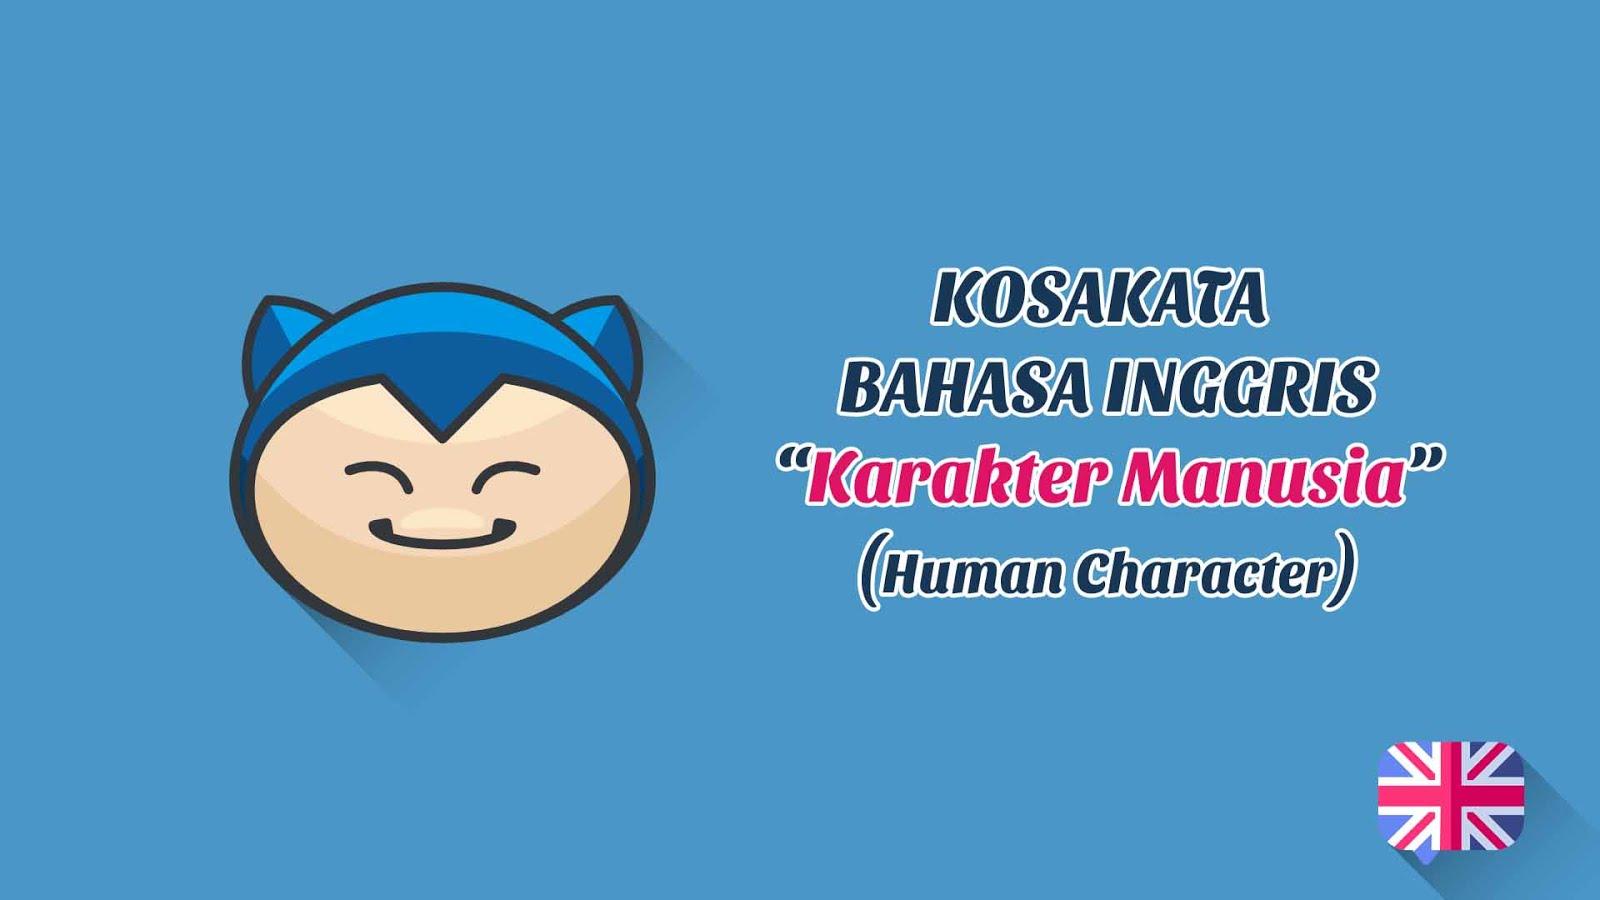 Karakter Manusia Baik dan buruk (Human Character) + Pronunciation (Kosakata Bahasa Inggris)